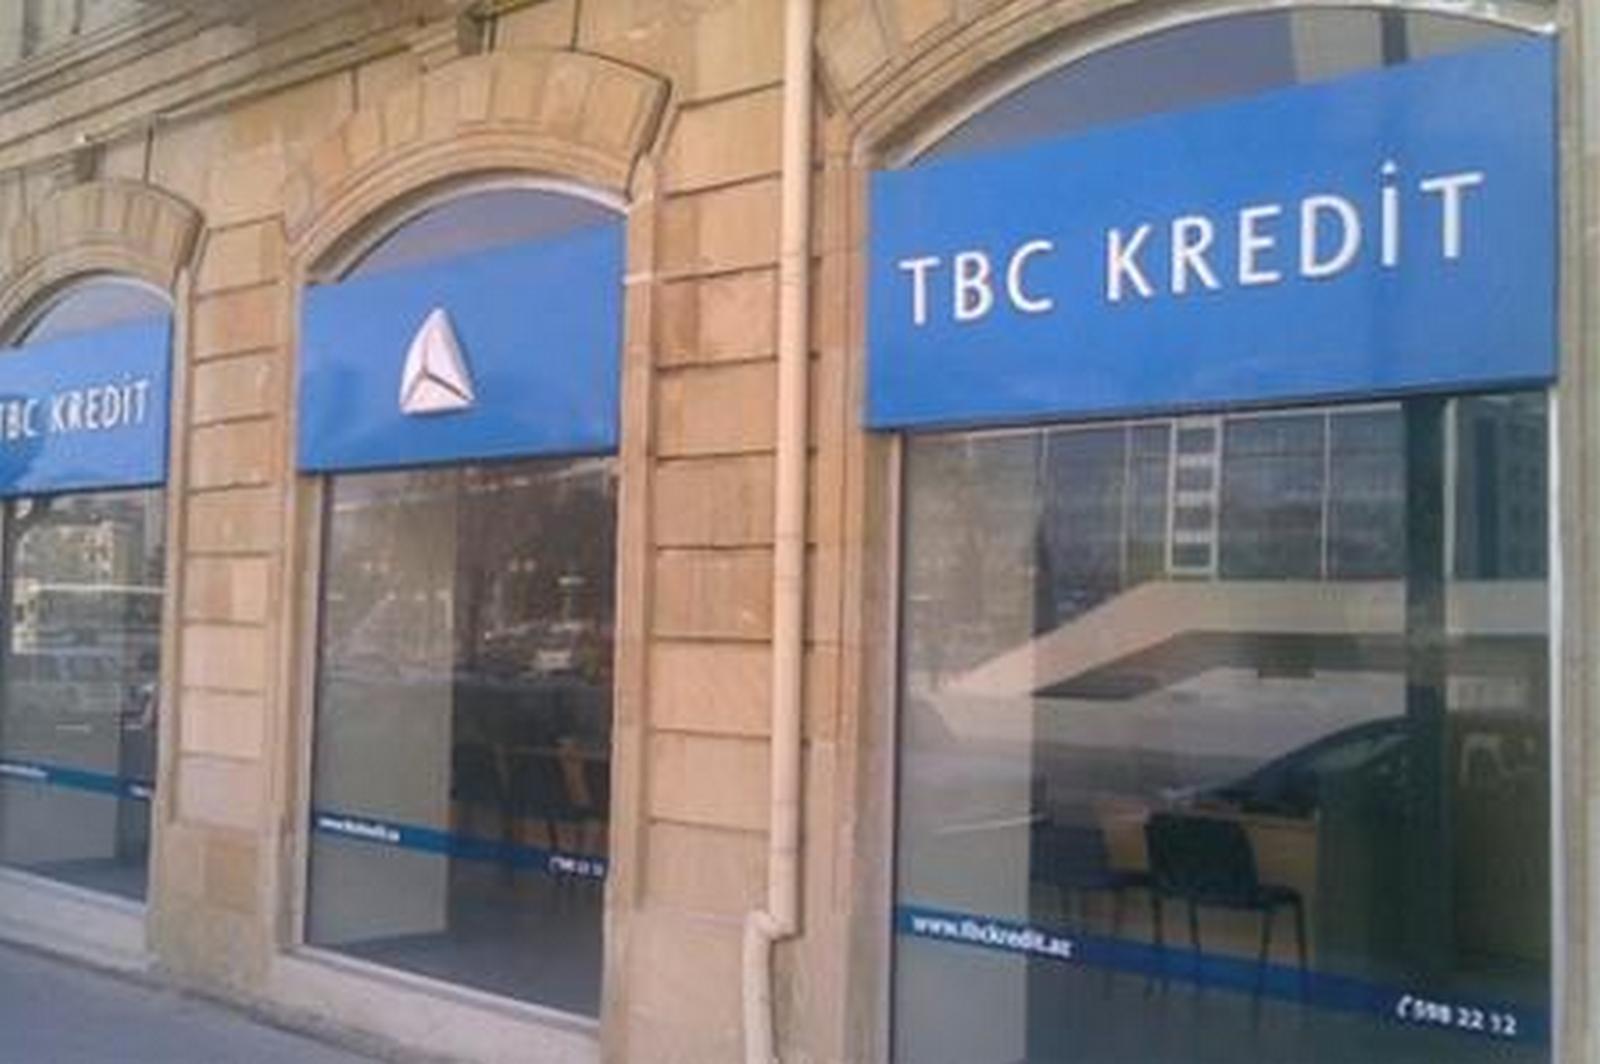 TBC Kredit VAKANSİYA ELAN ETDİ